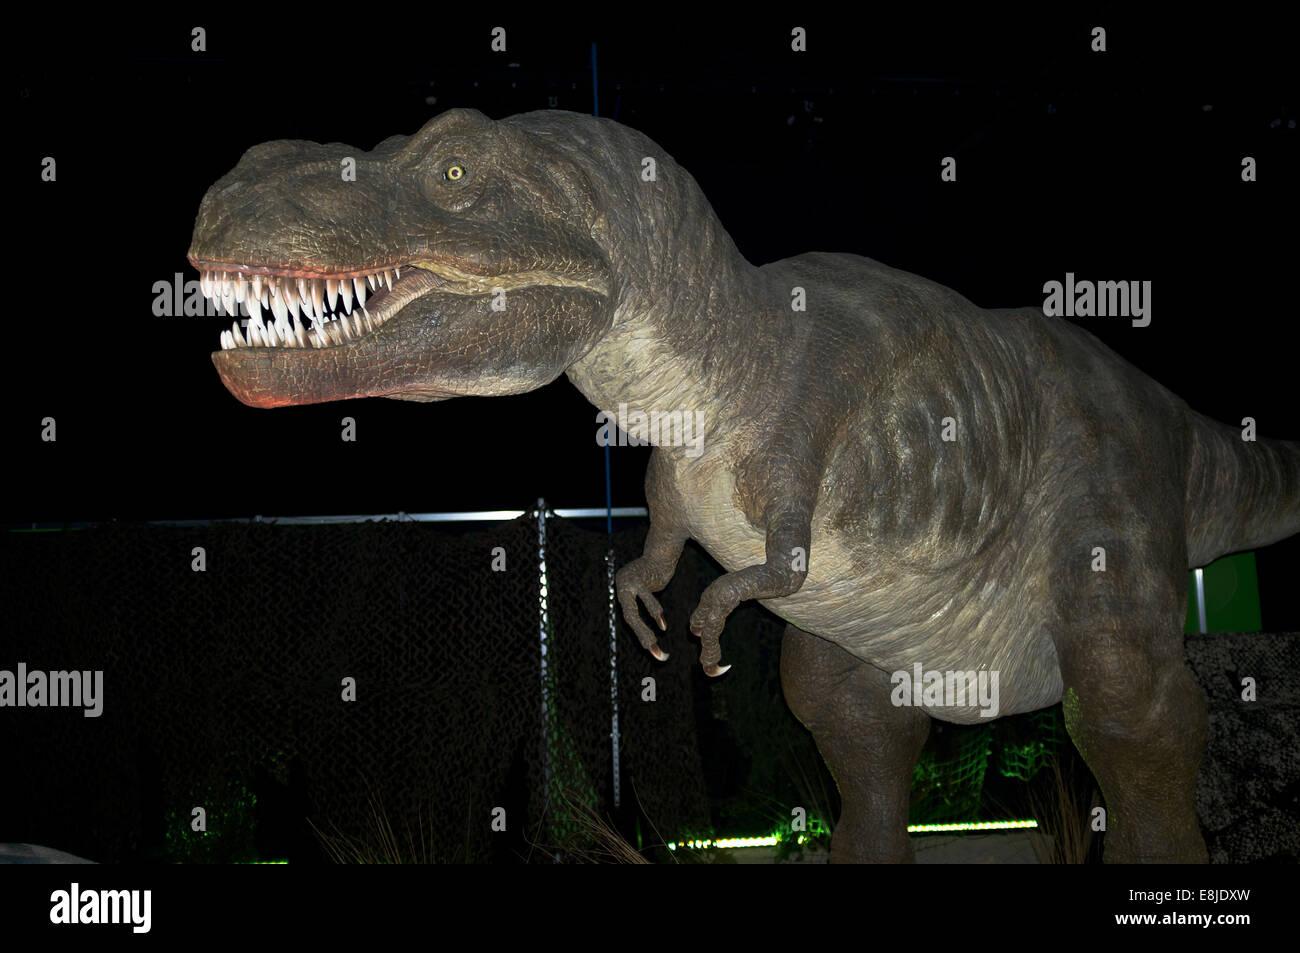 dh Tyrannosaurus rex PREHISTORIC ANIMAL Extinct T rex North American dinosaur bipedal carnivore - Stock Image